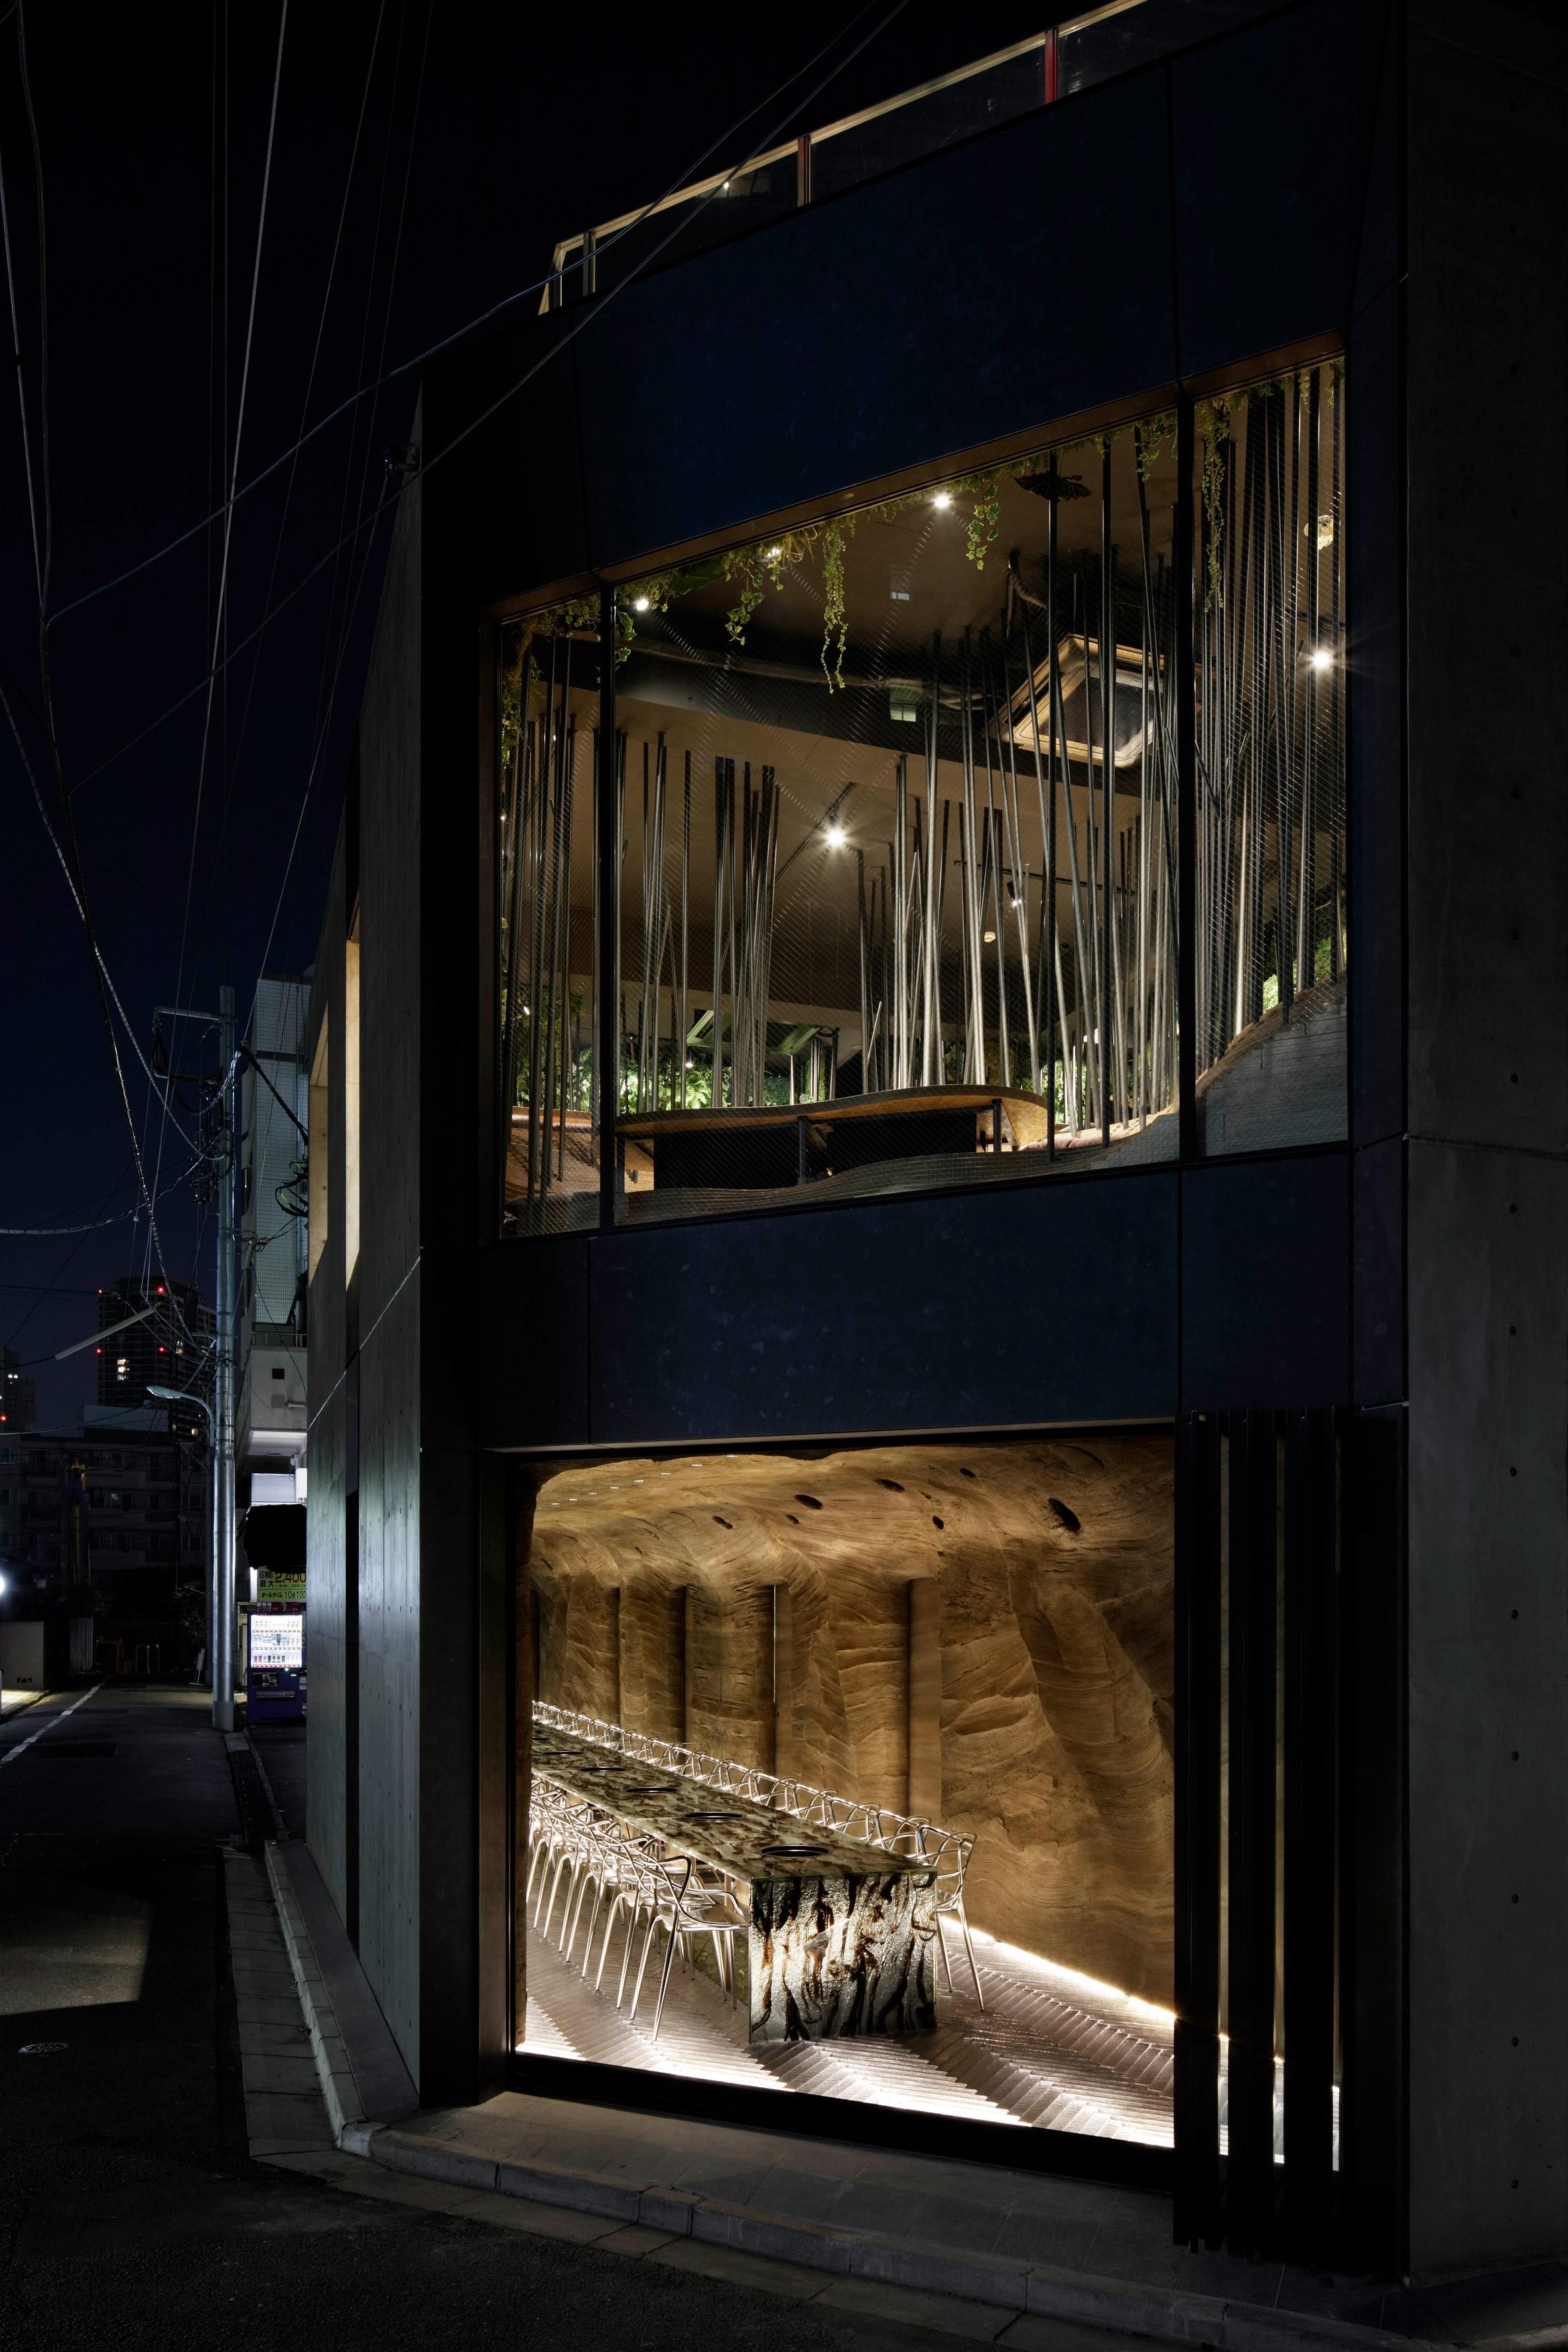 nikunotoriko-restaurant-interiors-tokyo-ryoji-Iedokoro-japan_dezeen_2364_col_0